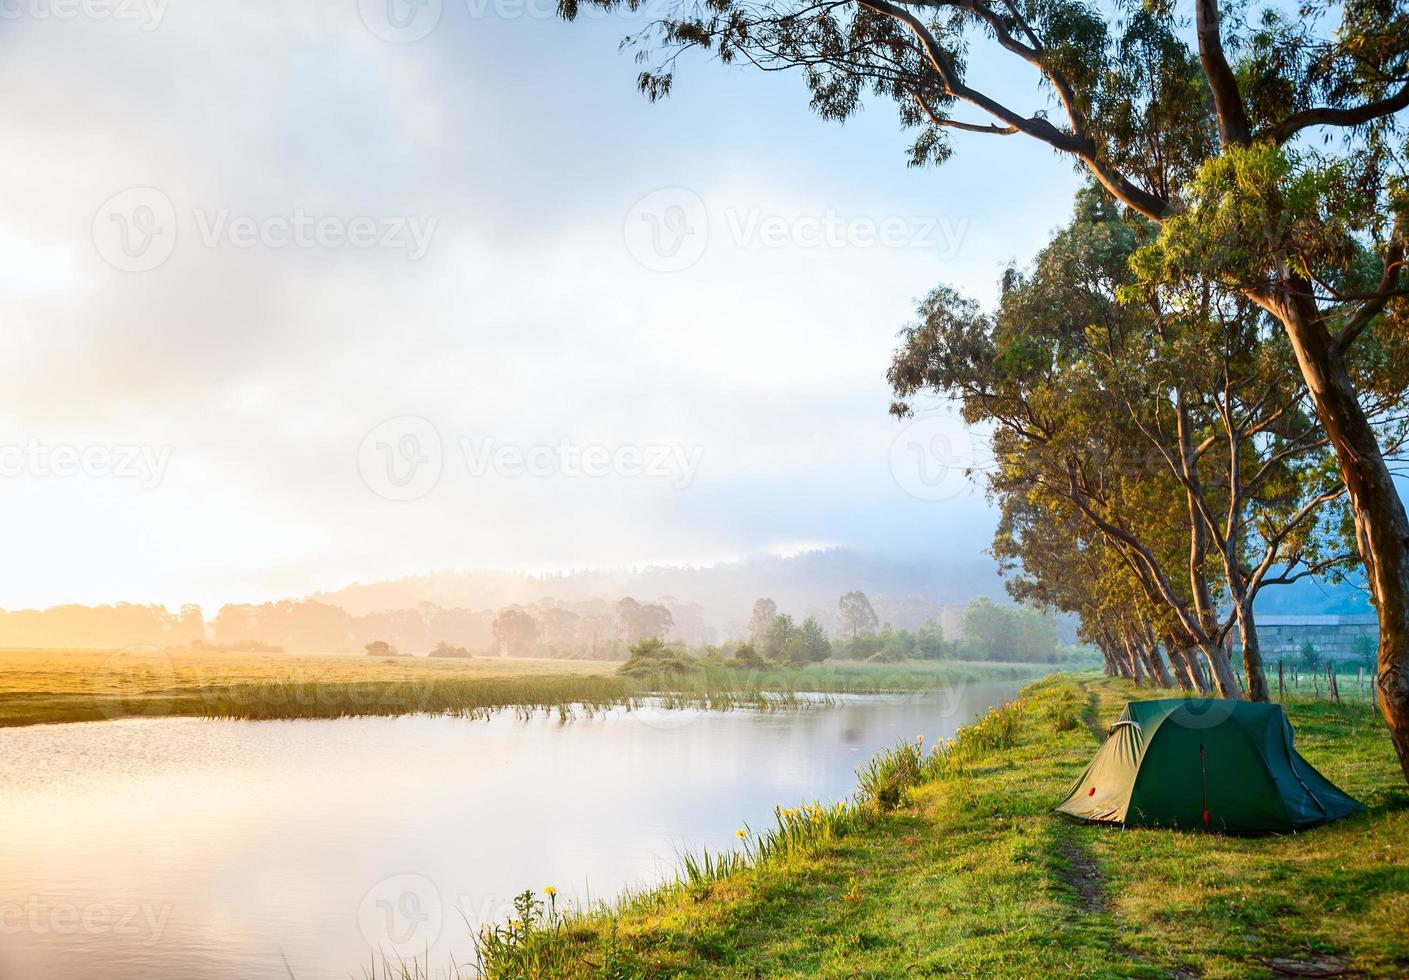 camping vid en flod foto